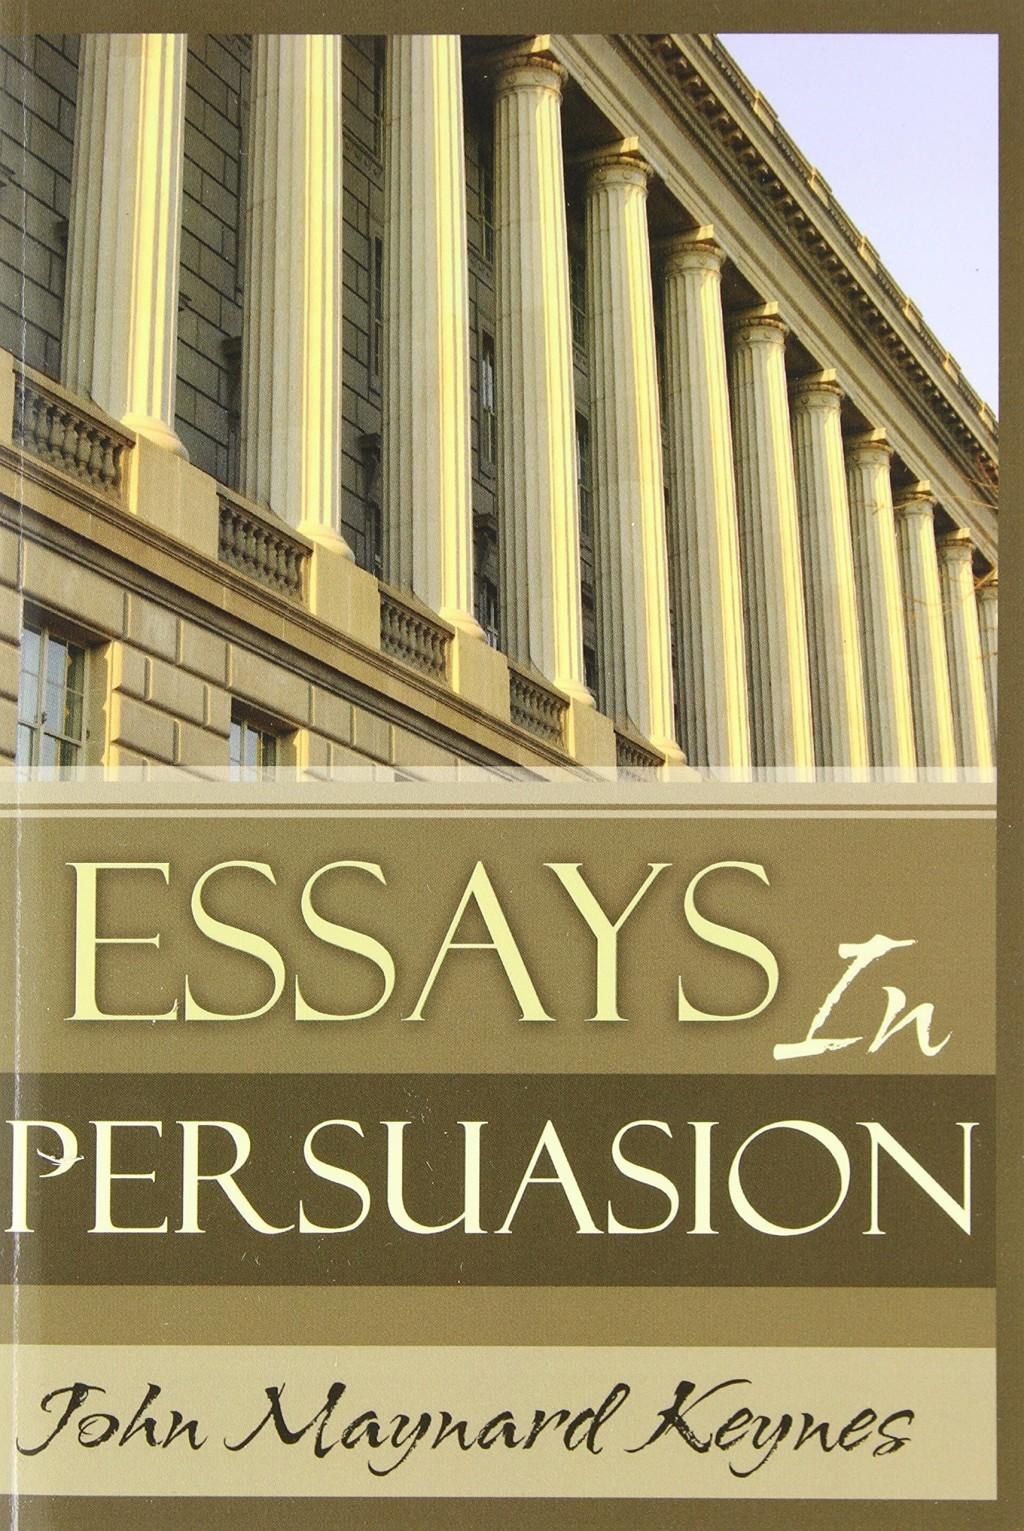 001 Essay Example A1hzb1u2bixl Essays In Remarkable Persuasion Audiobook Pdf John Maynard Keynes Summary Large